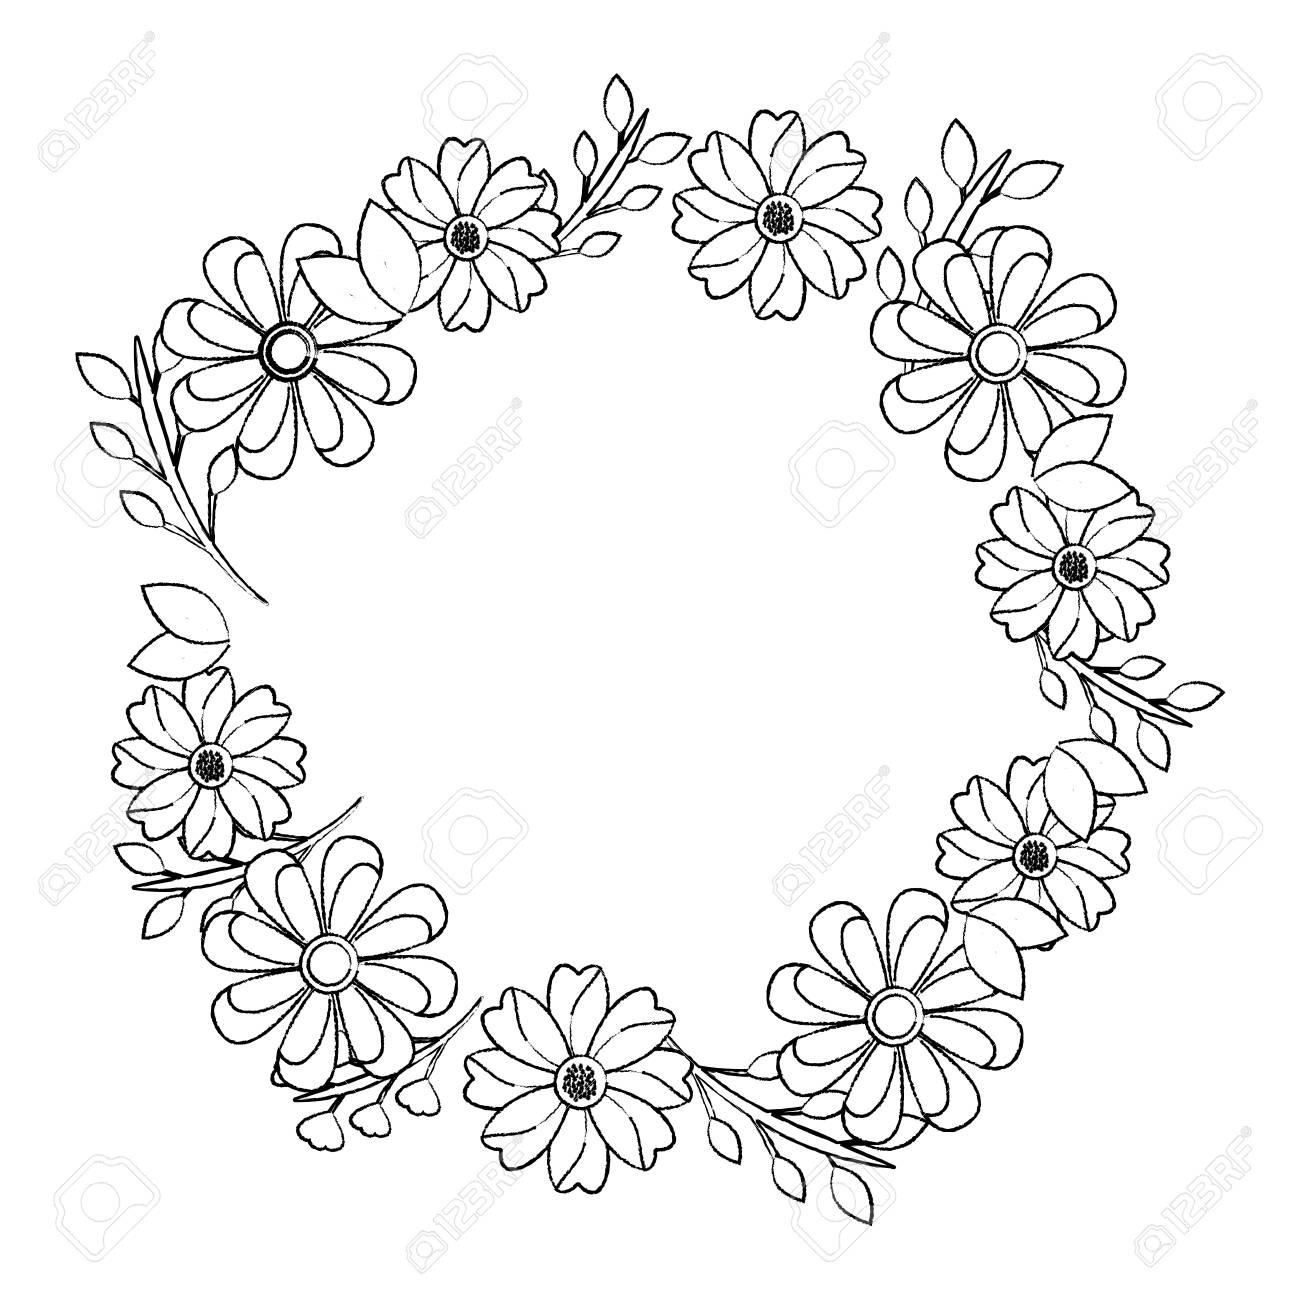 Flower crown emblem icon image vector illustration design black flower crown emblem icon image vector illustration design black sk stock vector 93452386 izmirmasajfo